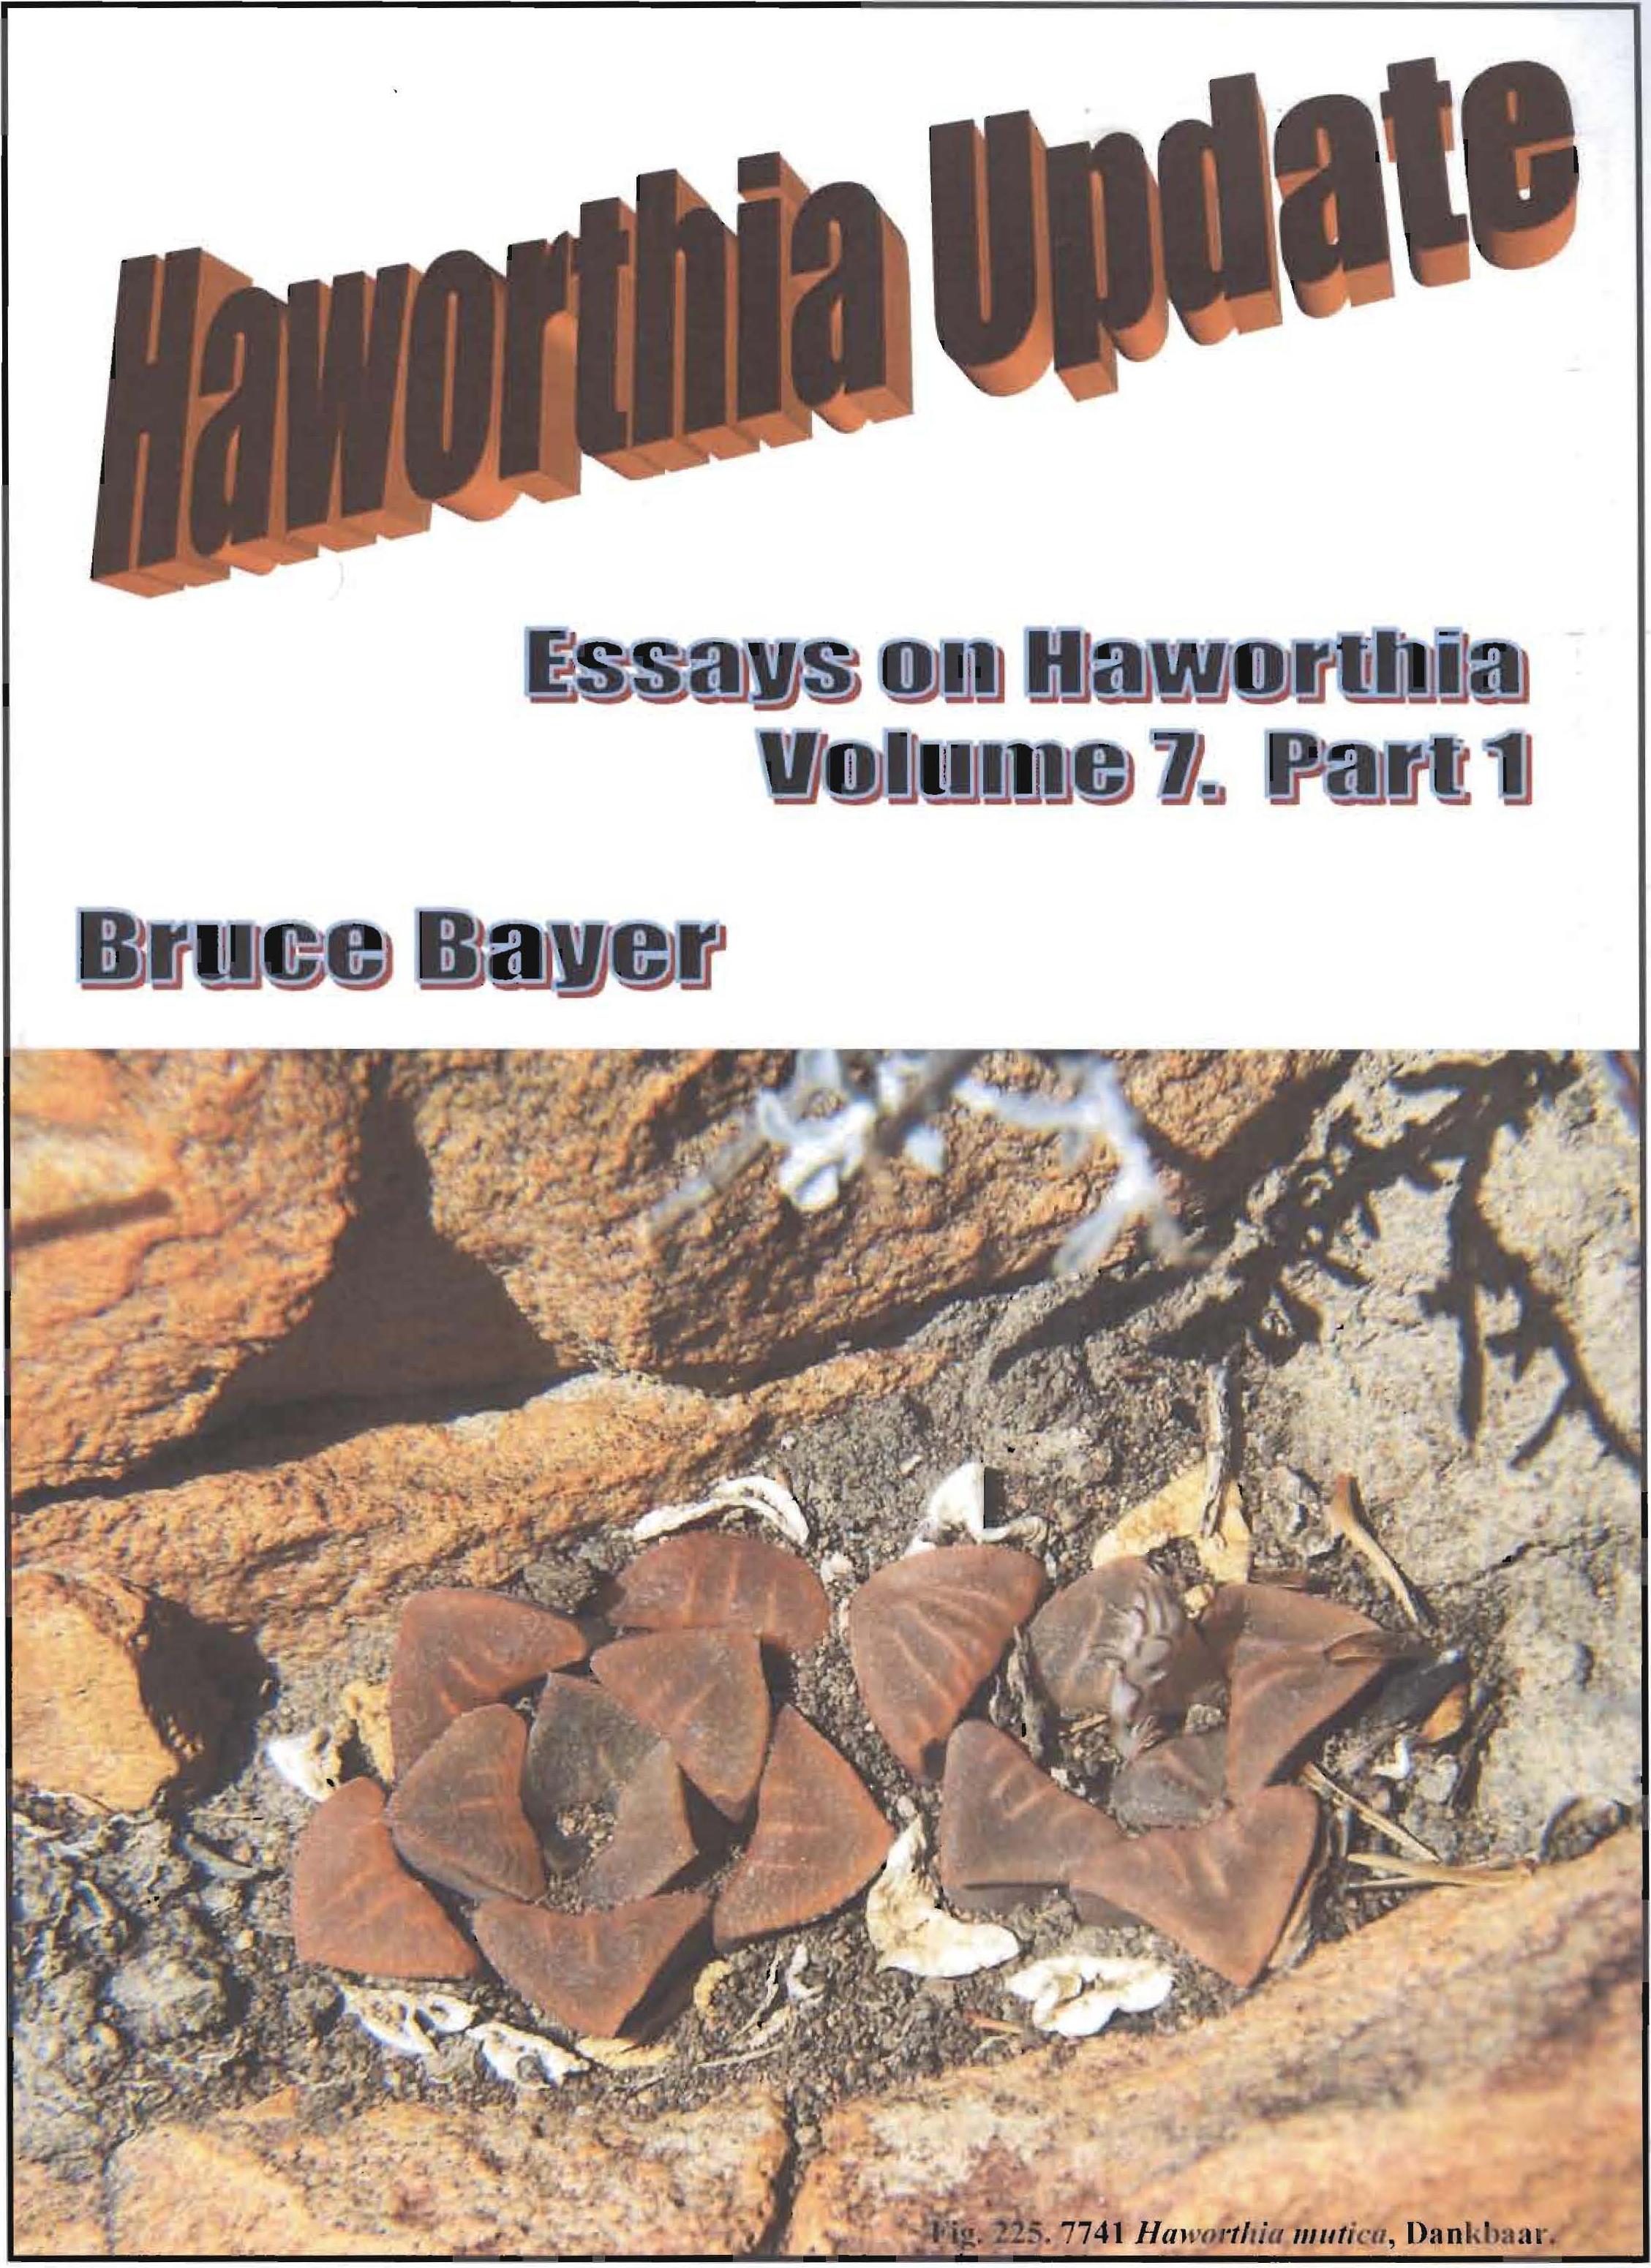 Haworthia Updates vol. 7